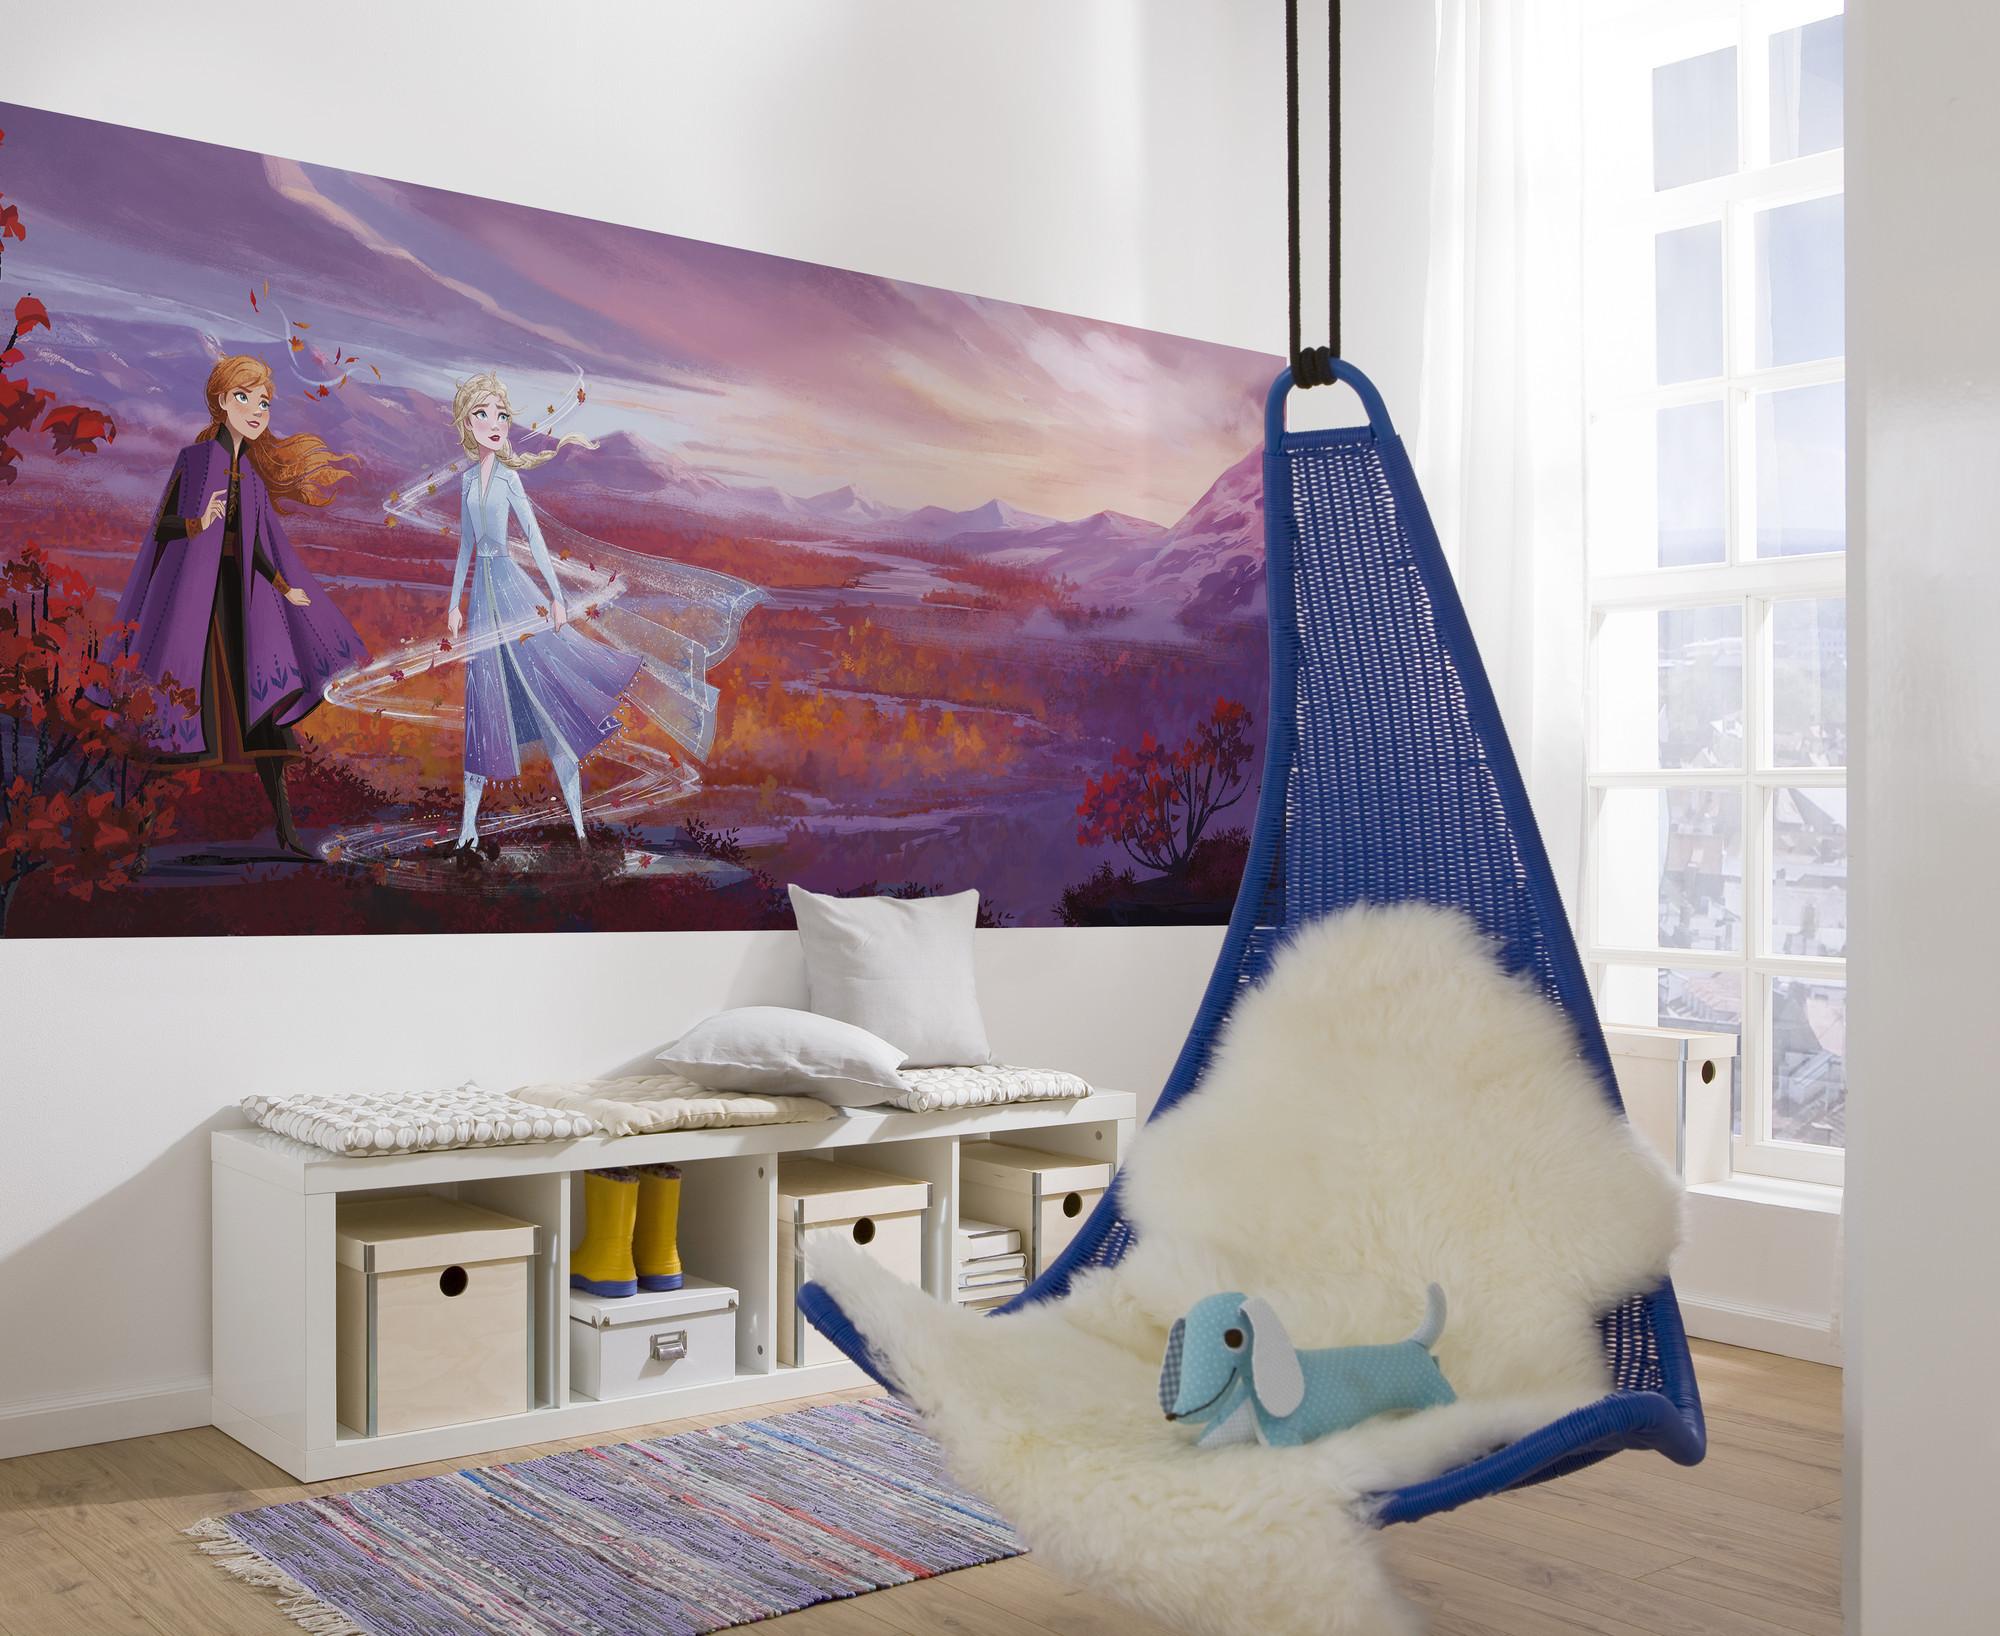 арт стена фотообои отзывы покупателей барышням